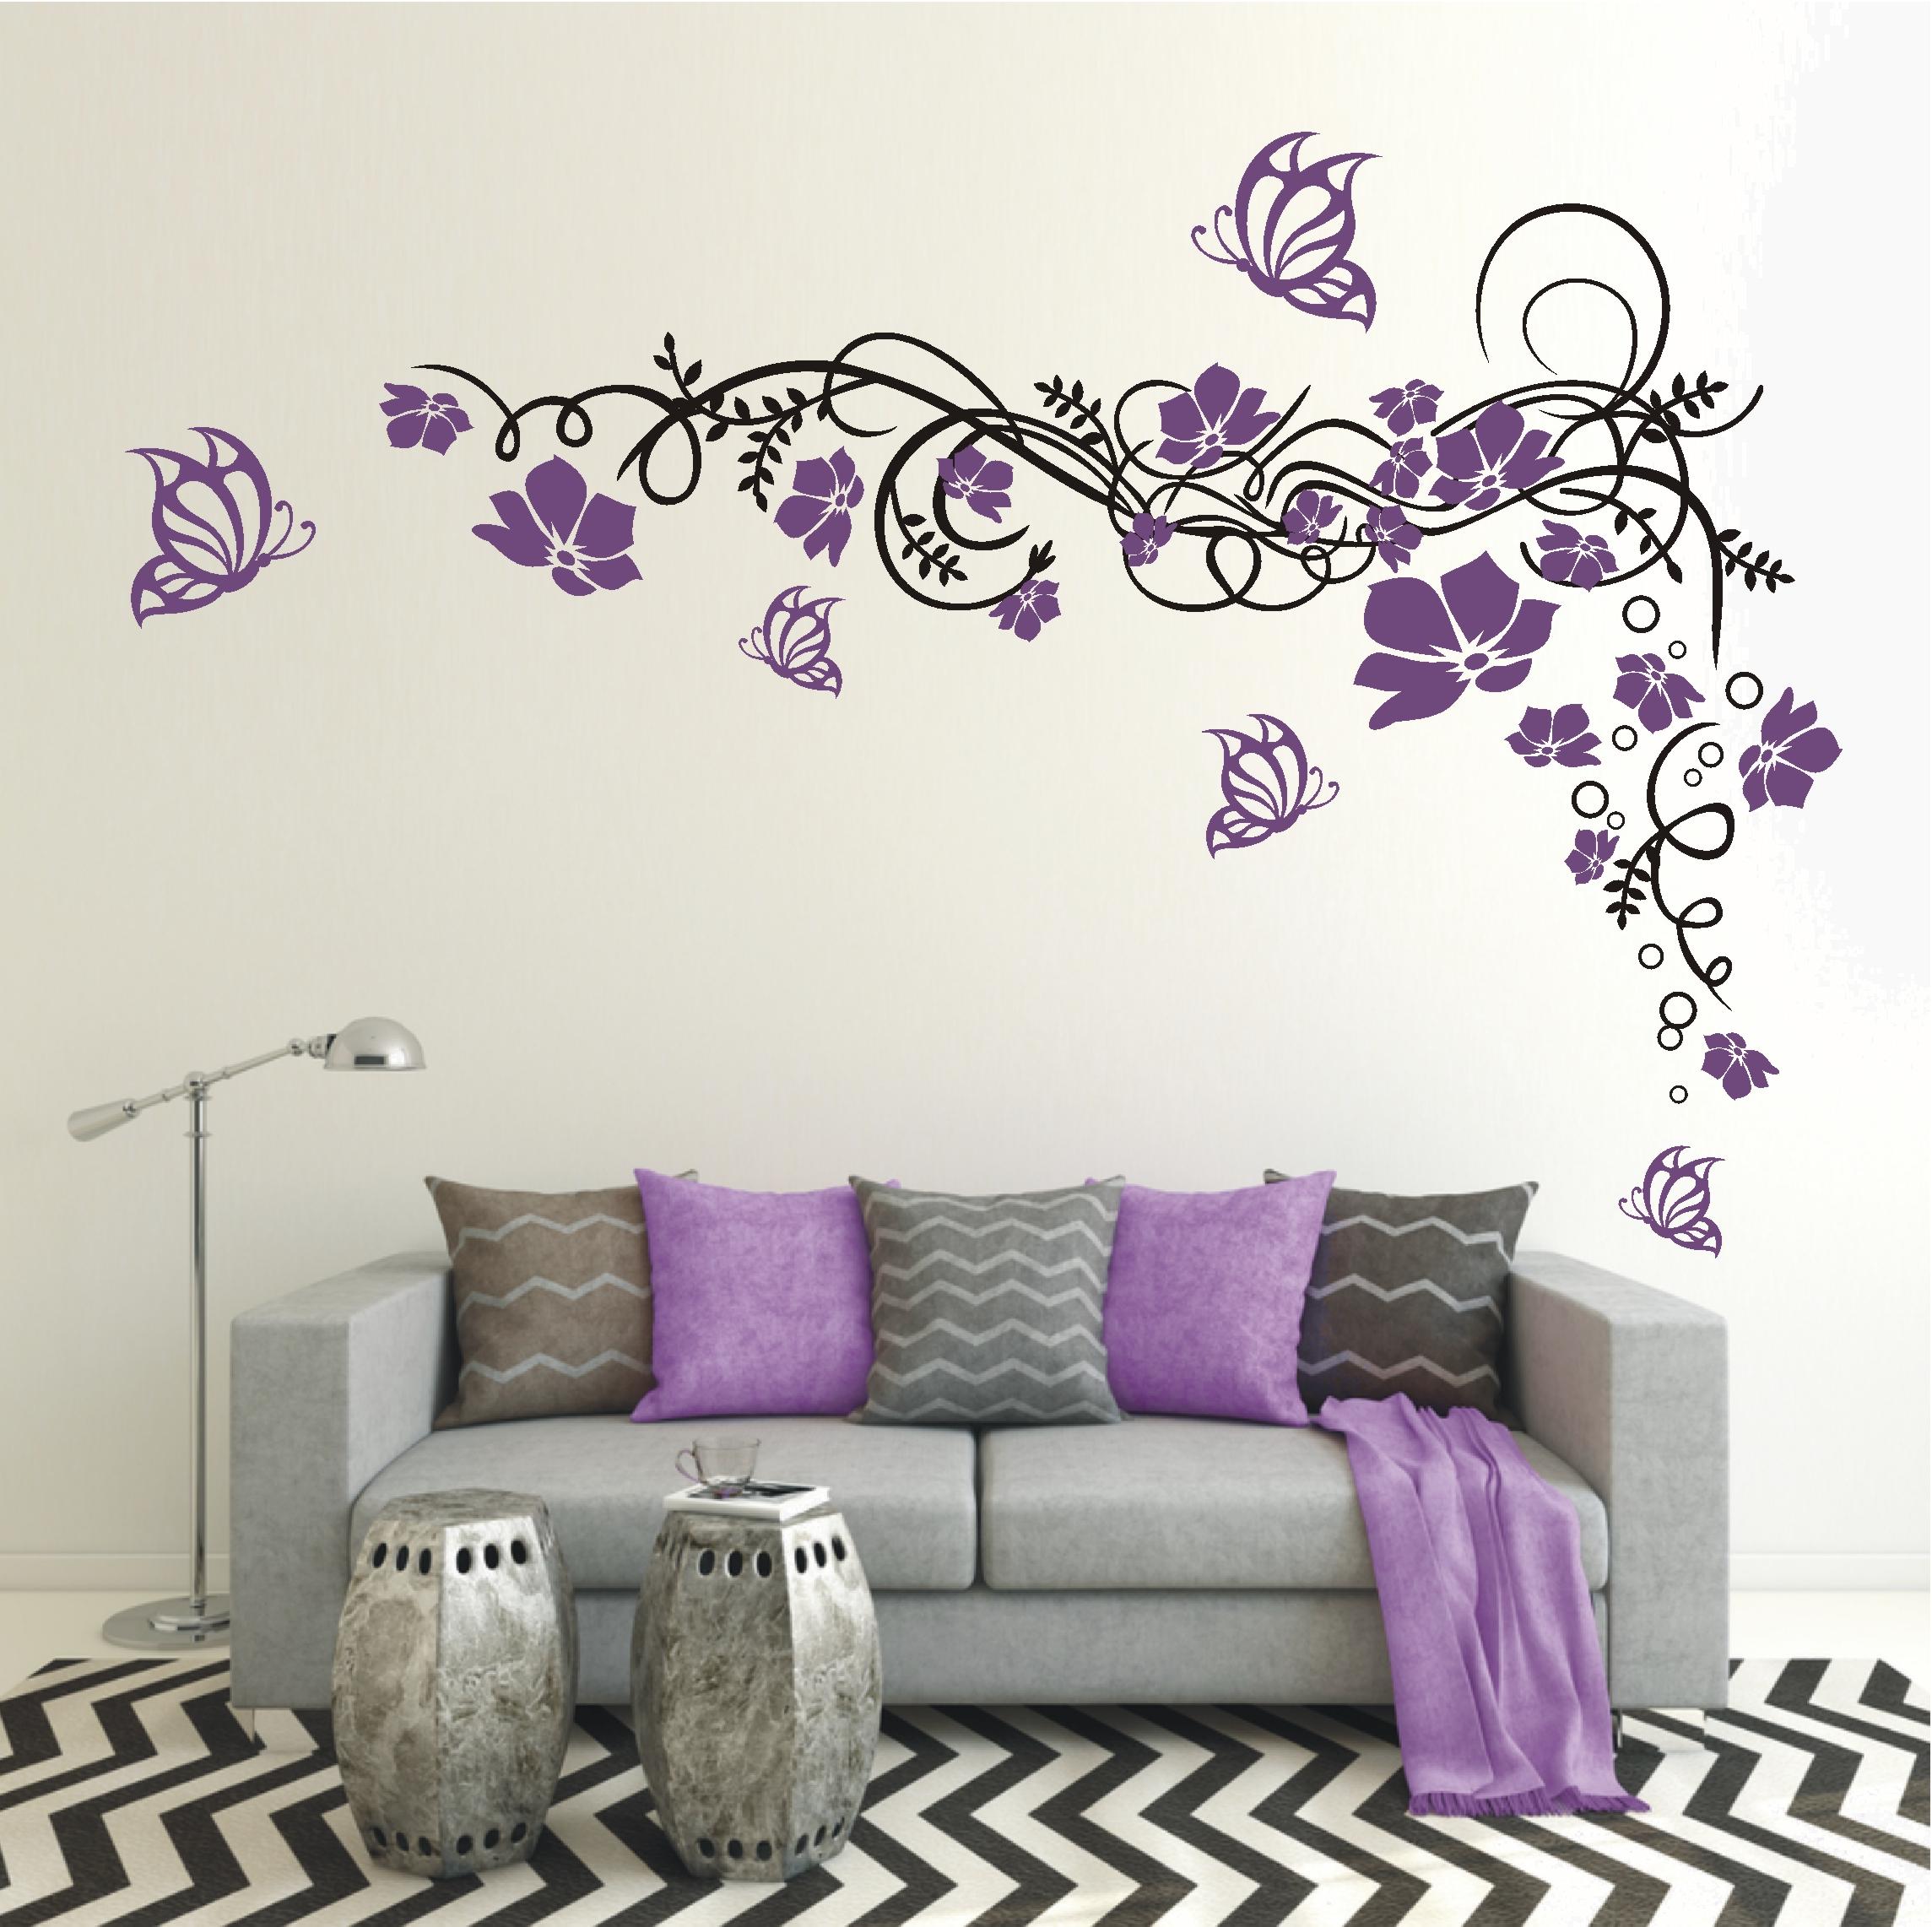 deko shop wandtattoo blumenranke 2 farbig deko shop. Black Bedroom Furniture Sets. Home Design Ideas